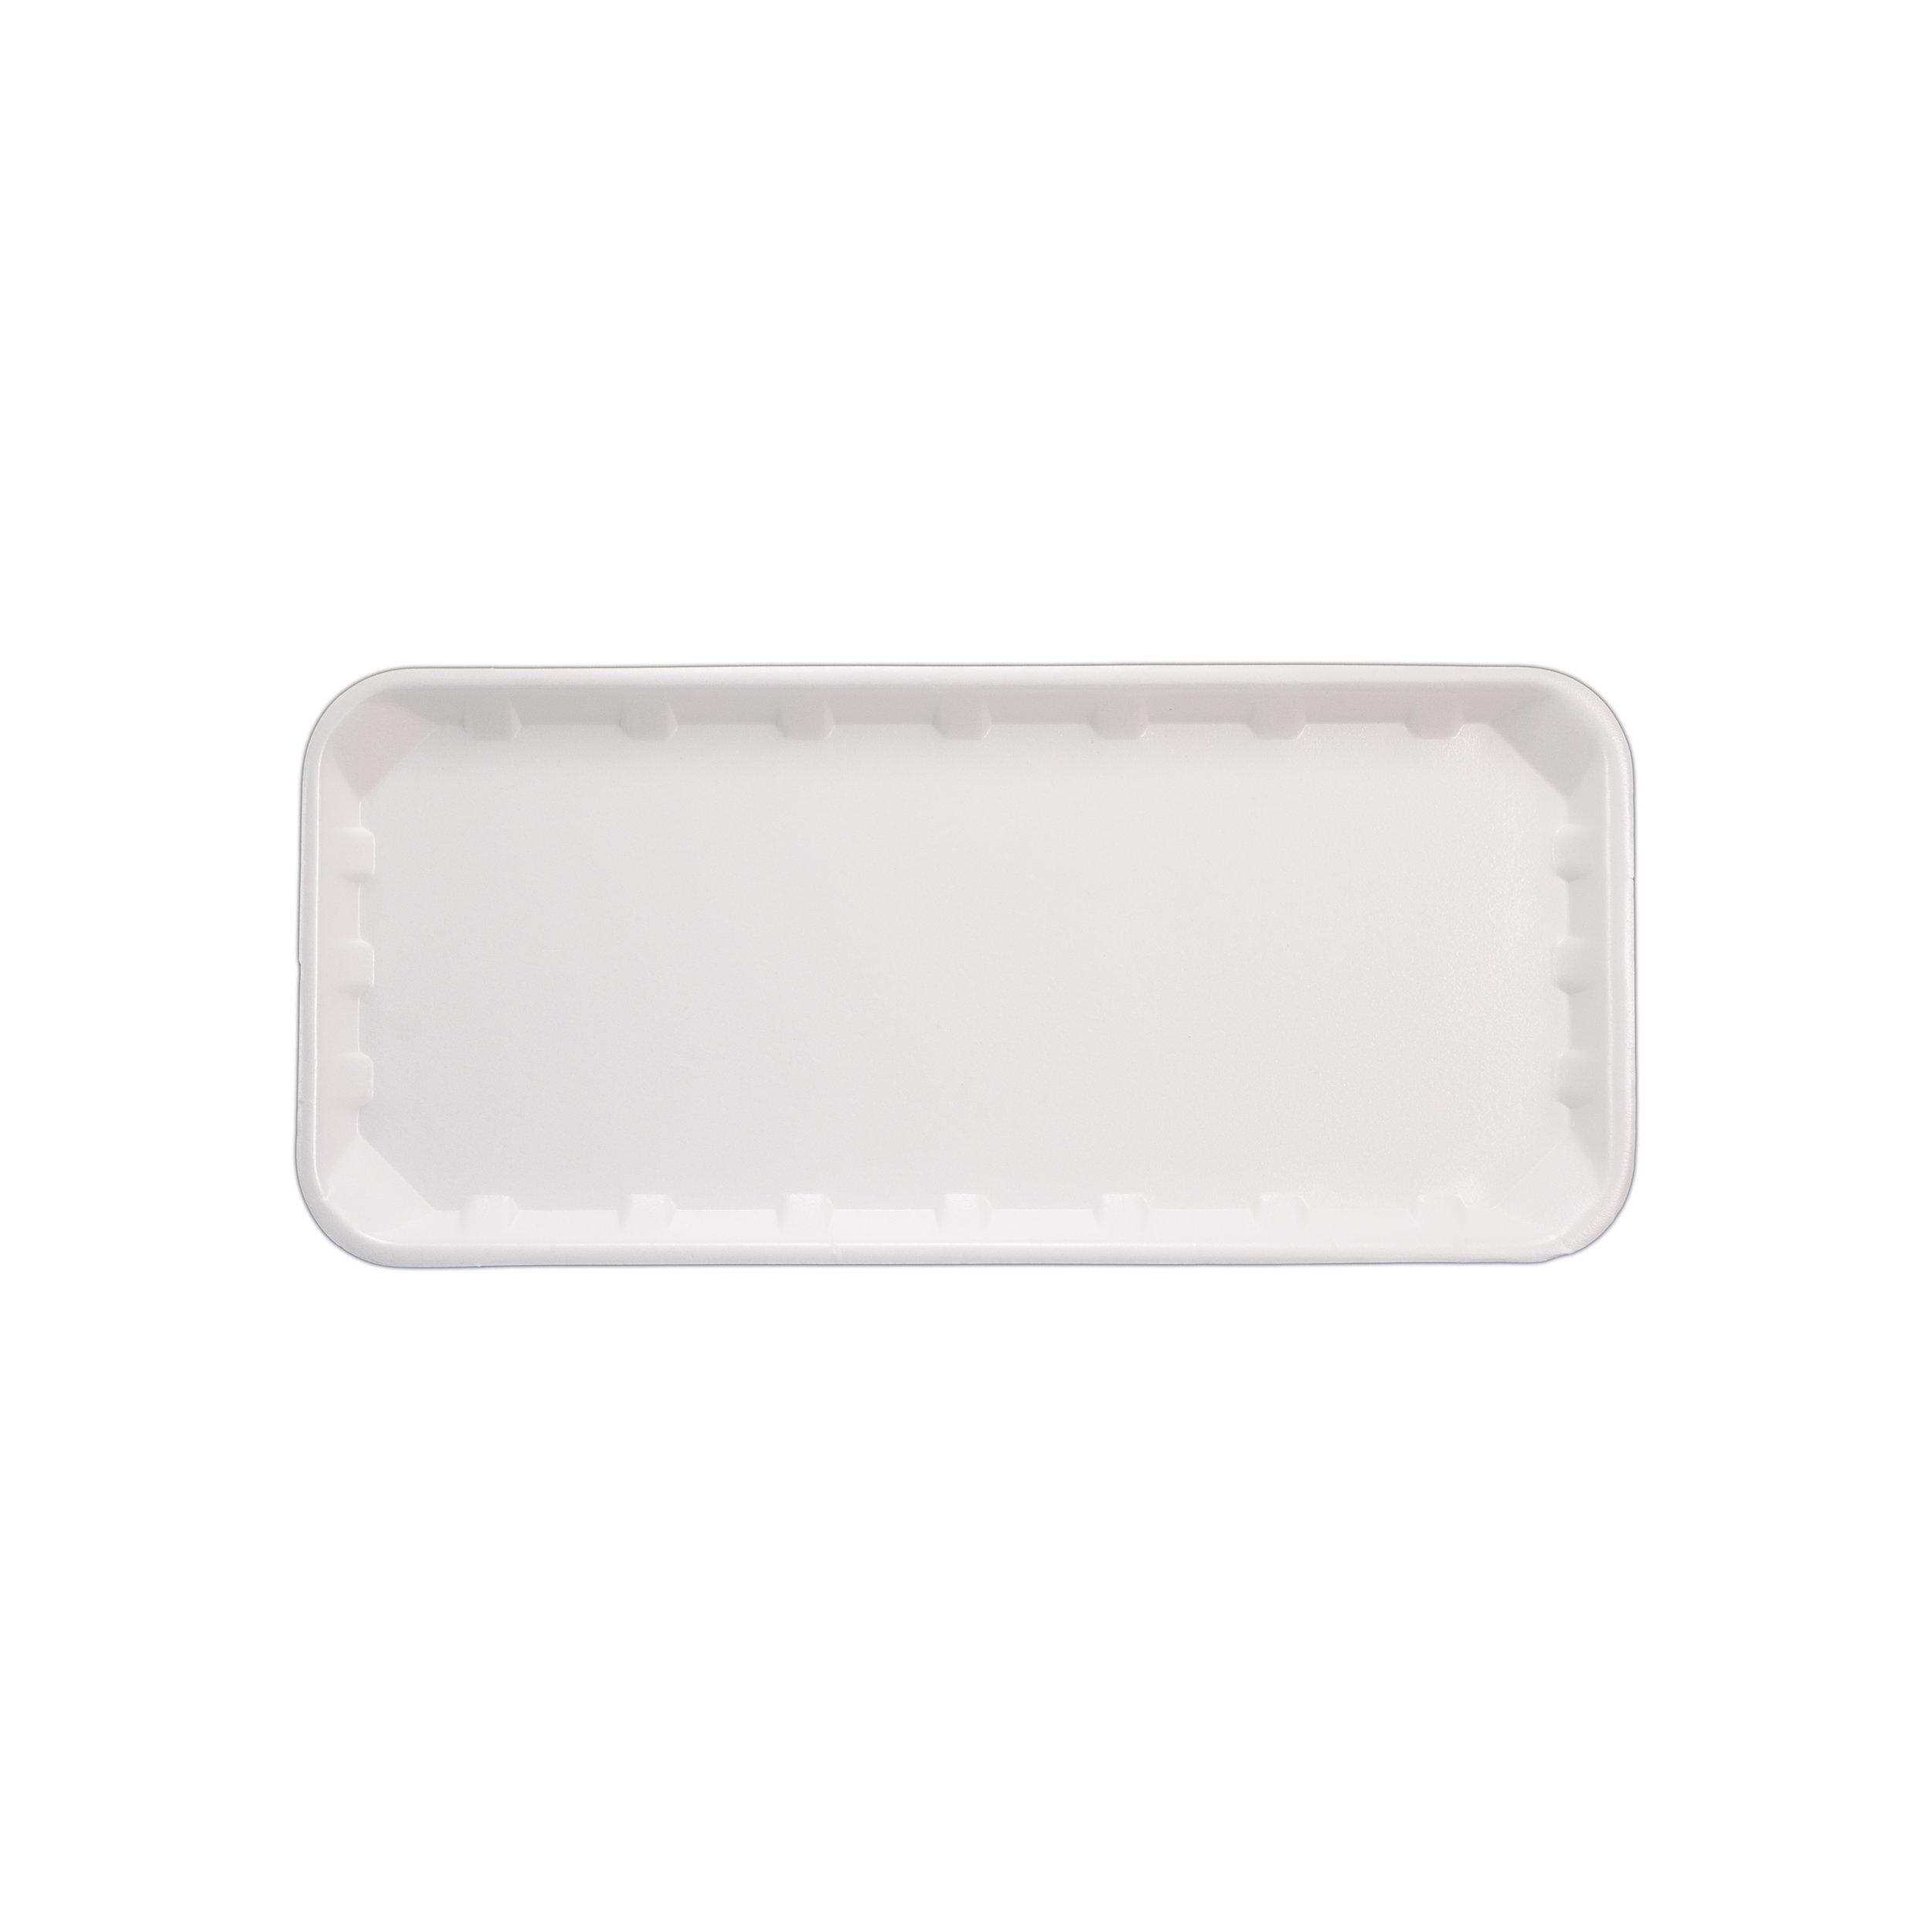 iK0313      CLOSED CELL SHALLOW 11x5    125 per sleeve 1000 per carton